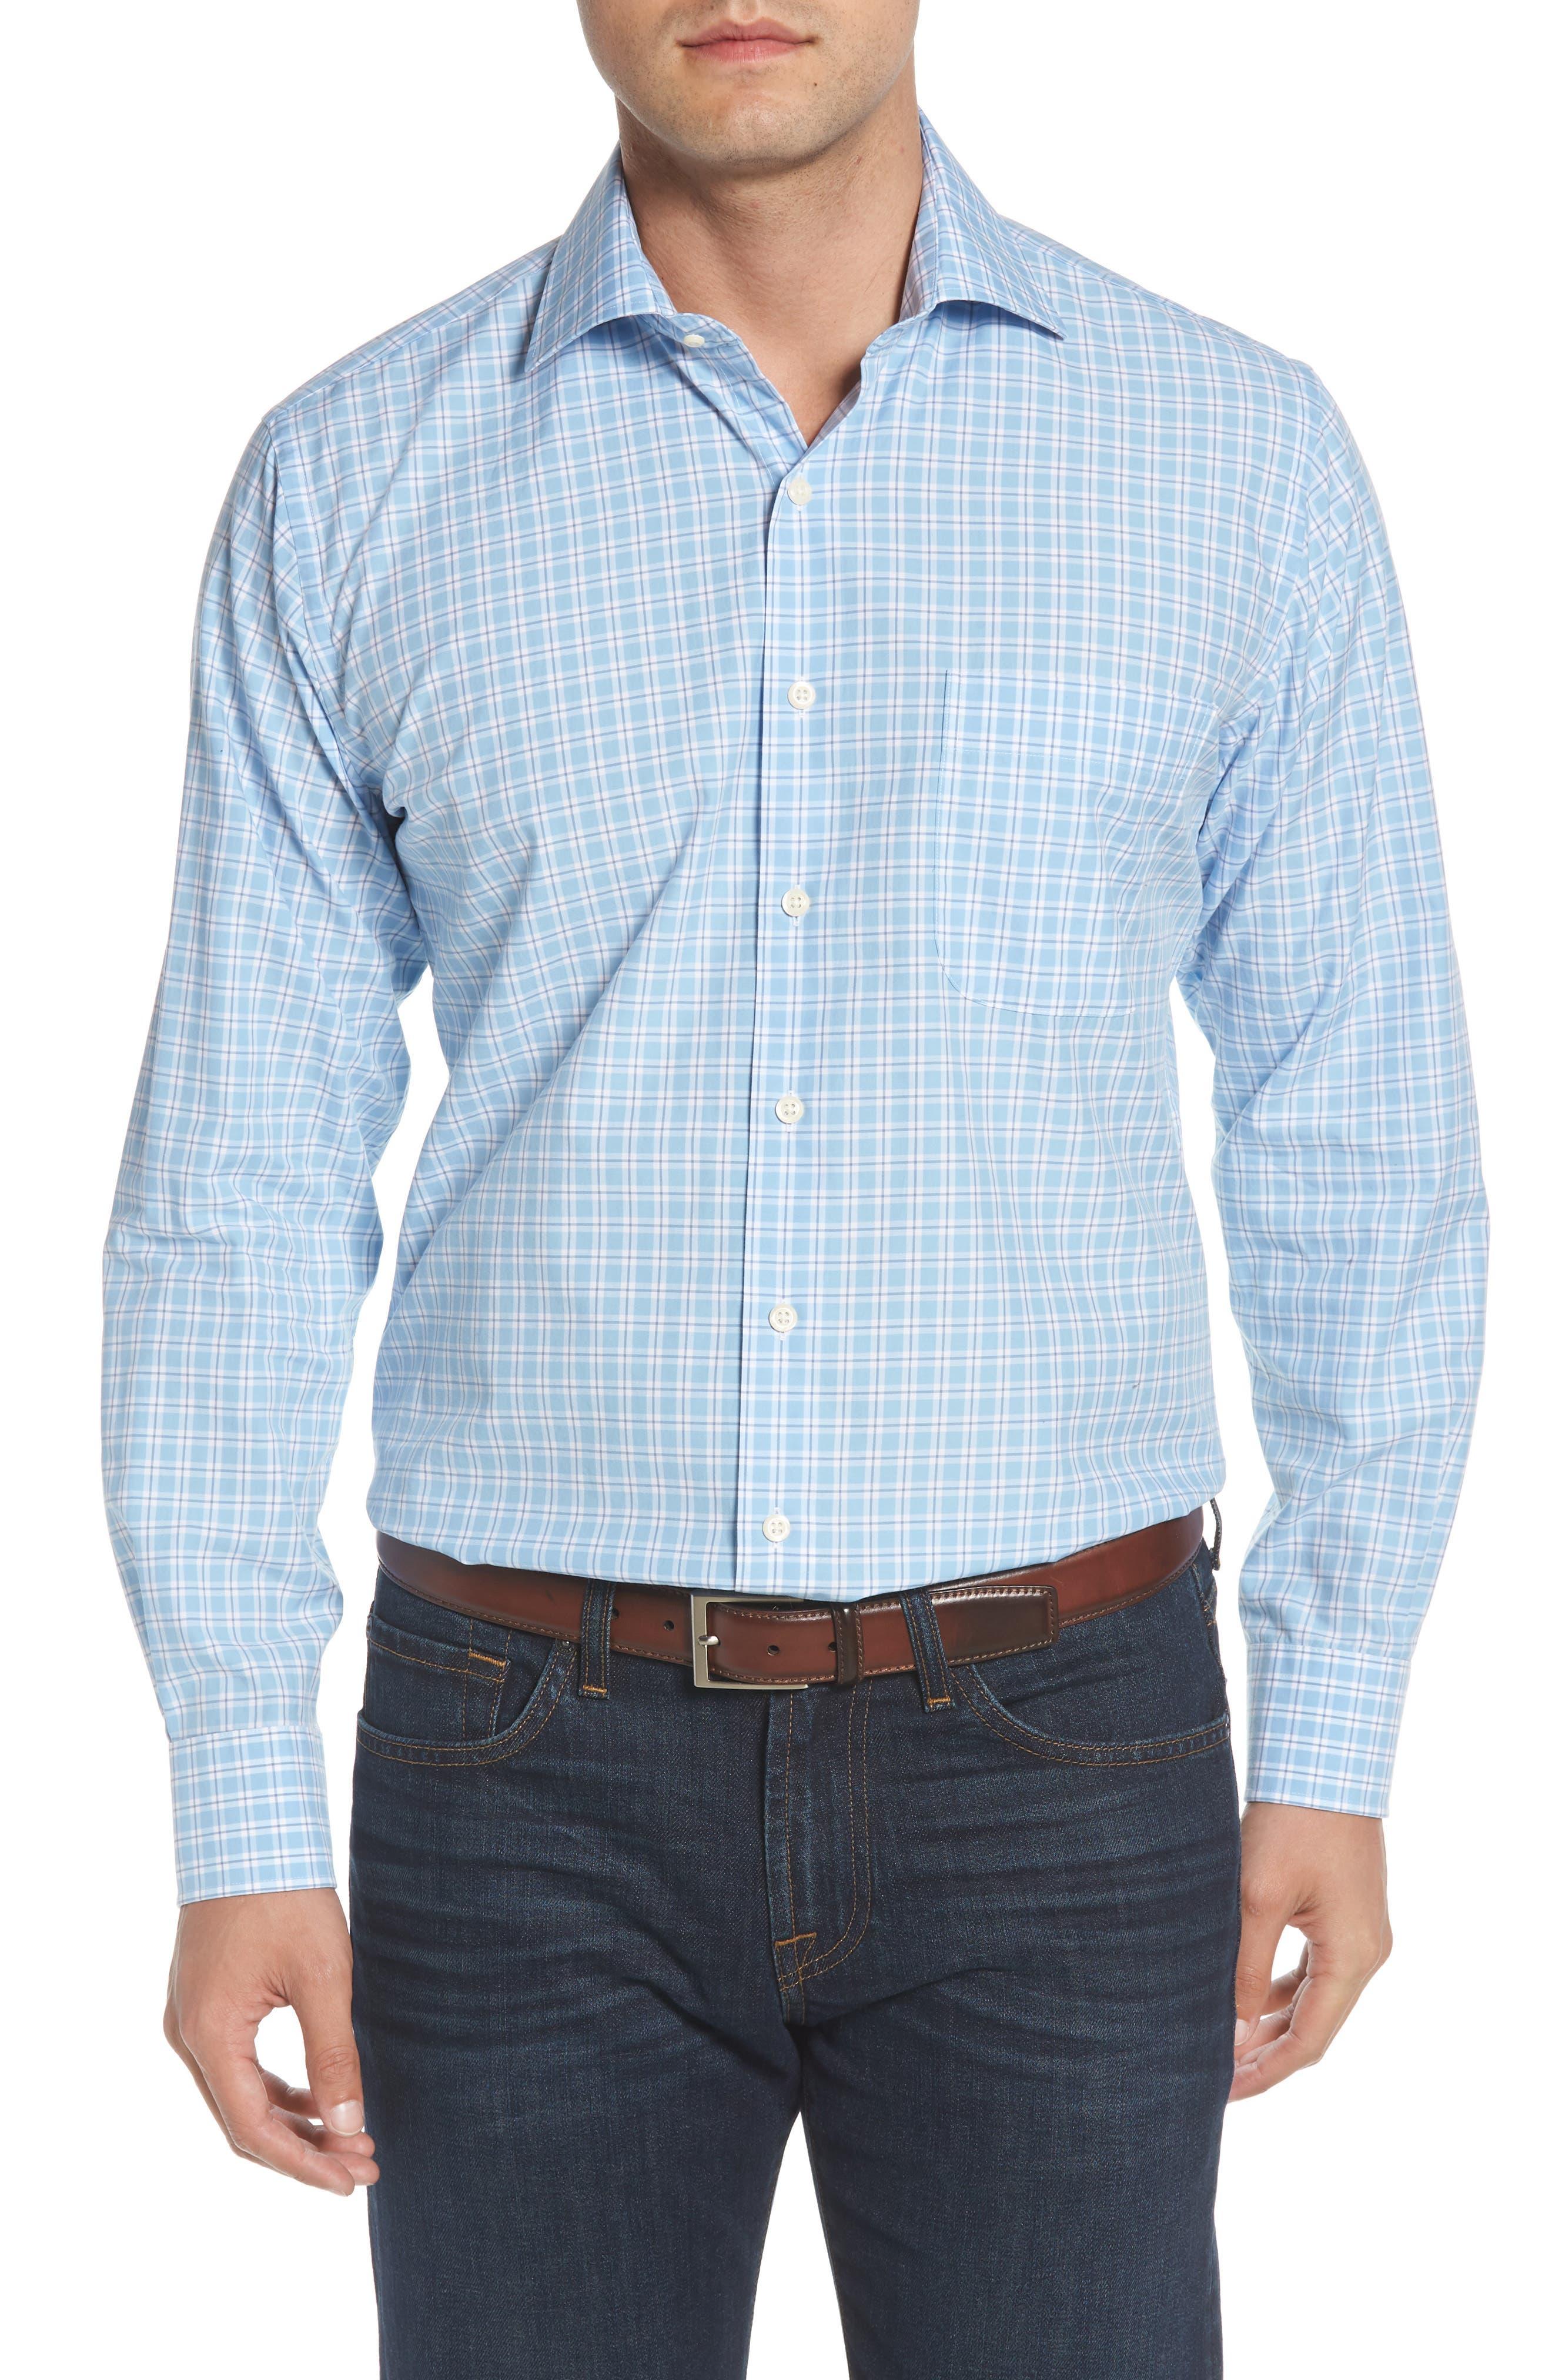 Ballard Regular Fit Check Sport Shirt,                             Main thumbnail 1, color,                             400